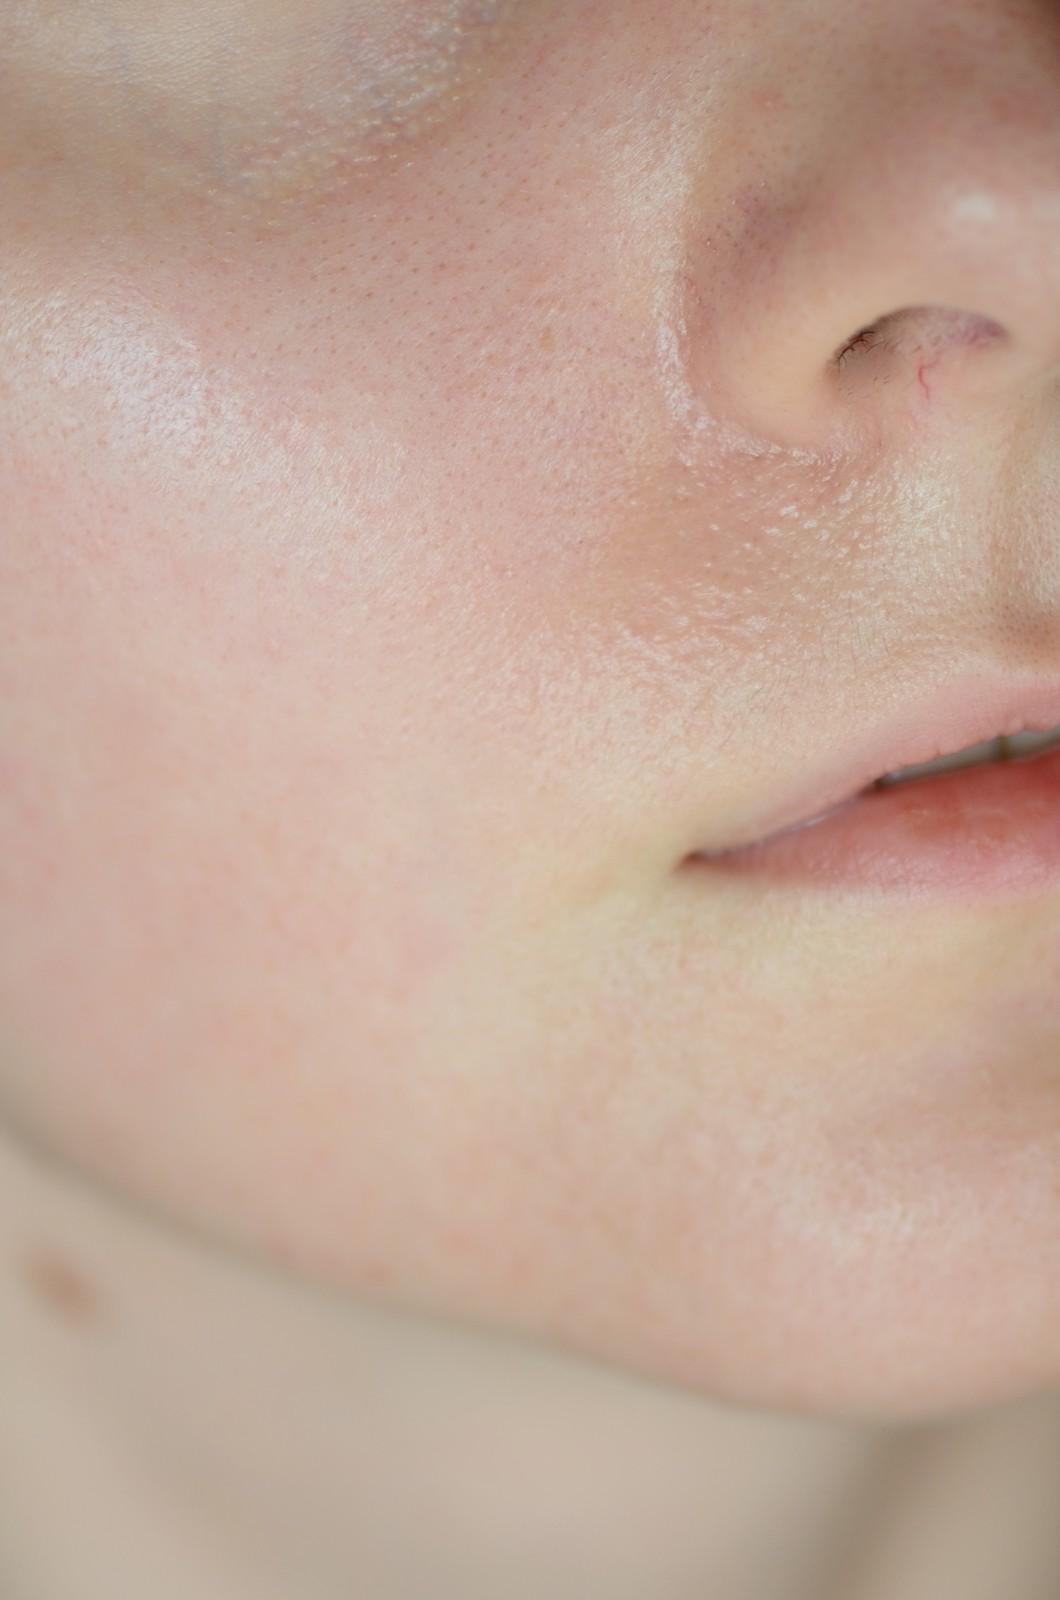 SVR SUN SECURE DRY TOUCH FLUIDE LEKKI KREM OCHRONNY NIEPOZOSTAWIAJĄCY SMUG SPF 50+  kremz  filtrem dla suchej skóry krem któy nie podrażnia z filtrem (1)